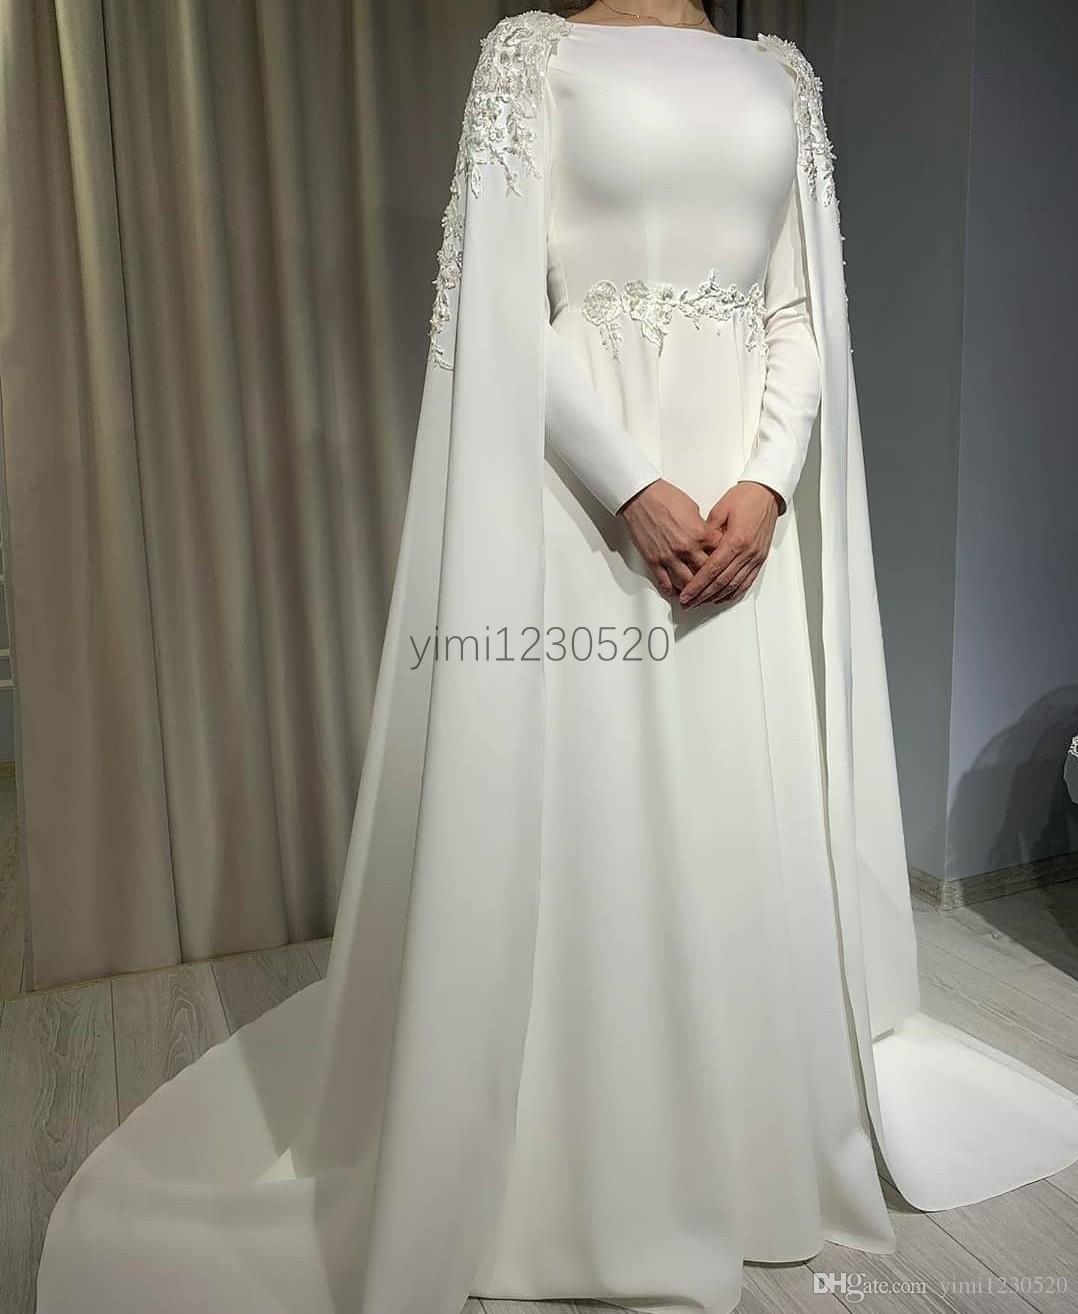 New Arabic Wedding Dresses 2020 Bateau Sweep Train Appliques Beads Garden Country Chapel Bridal Go Cape Wedding Dress Wedding Dresses Uk Arabic Wedding Dresses [ 1314 x 1078 Pixel ]